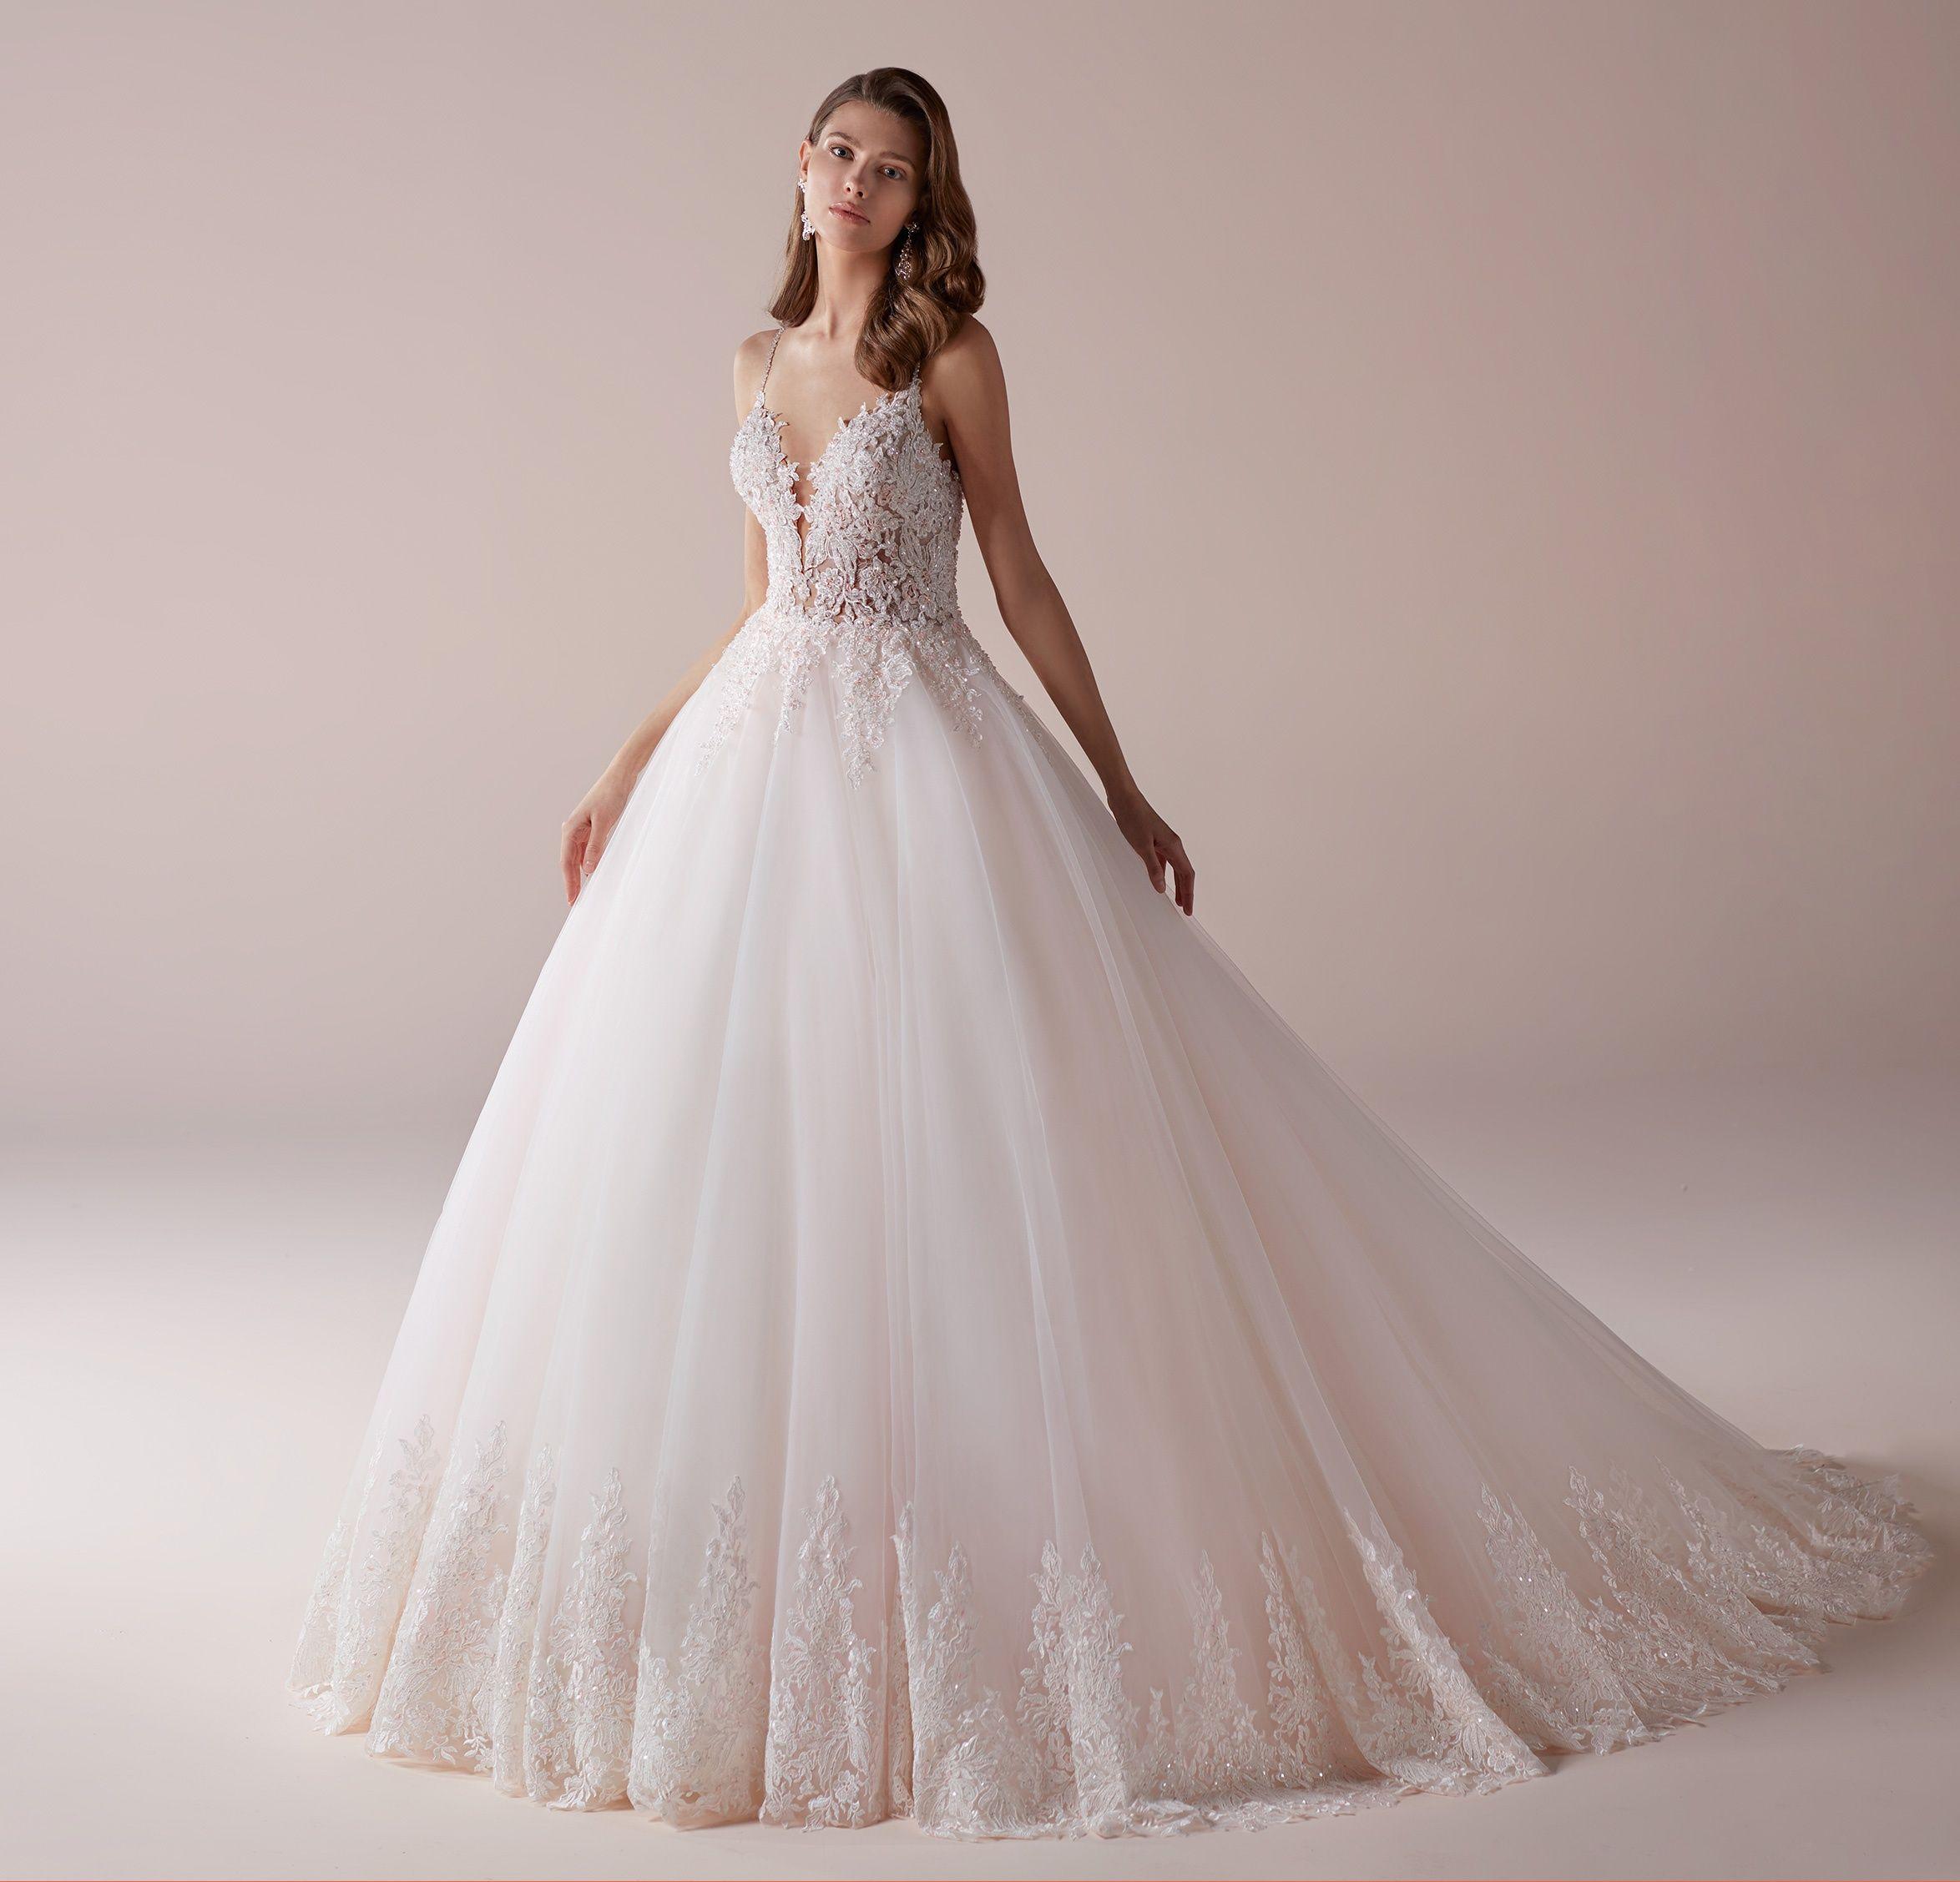 Moda Sposa 2019 Collezione Romance Roab191111 Abito Da Sposa Nicole Wedding Dress Outlet Wedding Dresses Bridal Wedding Dresses